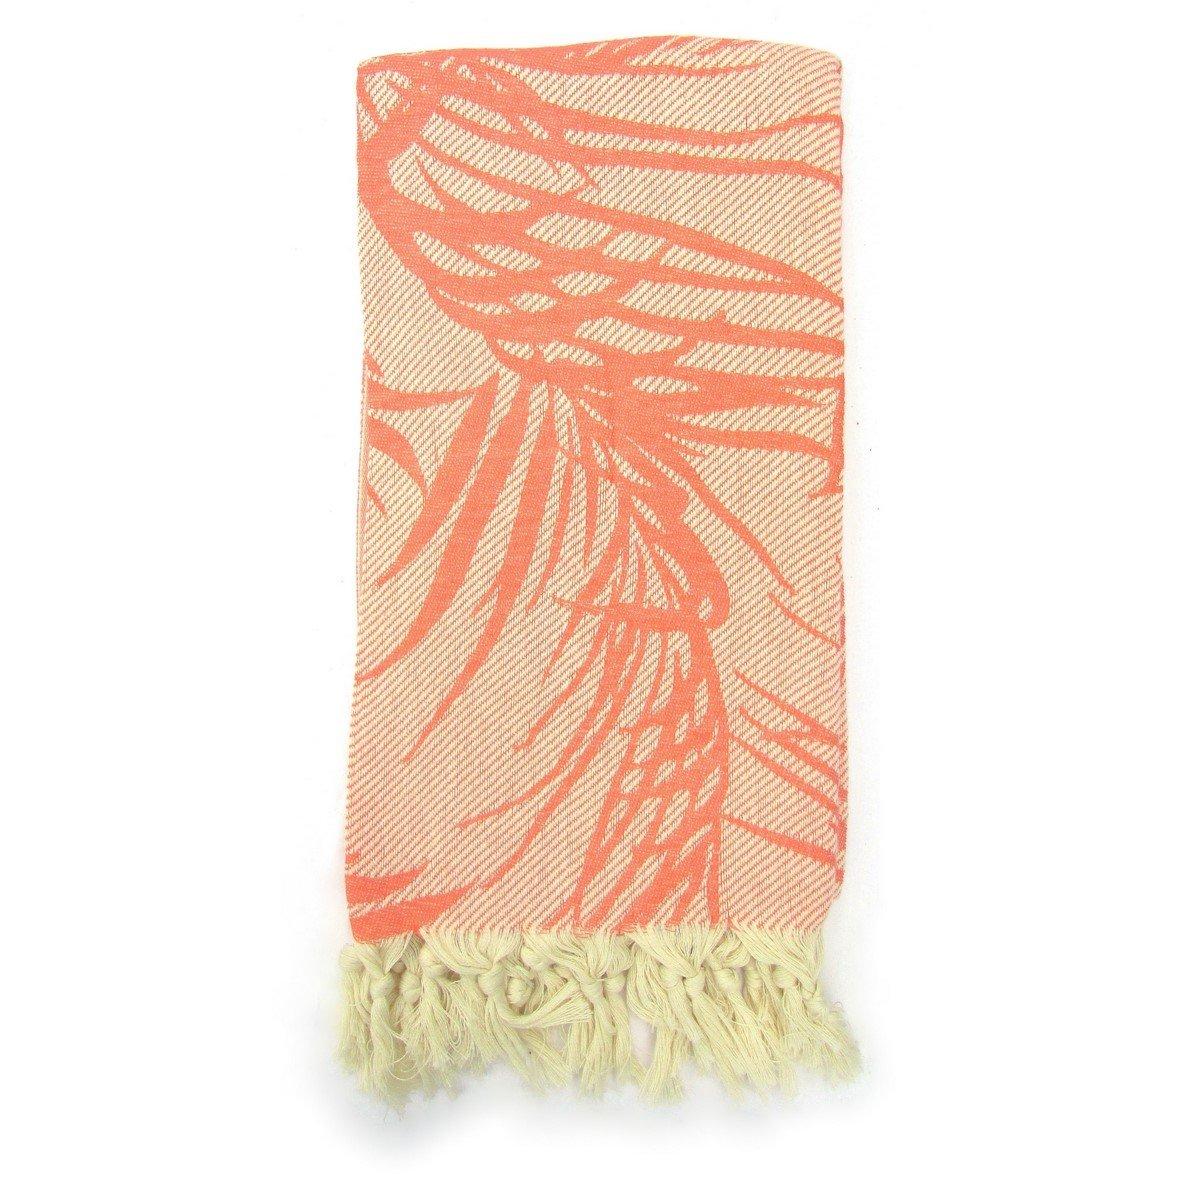 Rojo Granada jungla 100% algodón Jacquard turco toalla de baño: Amazon.es: Hogar